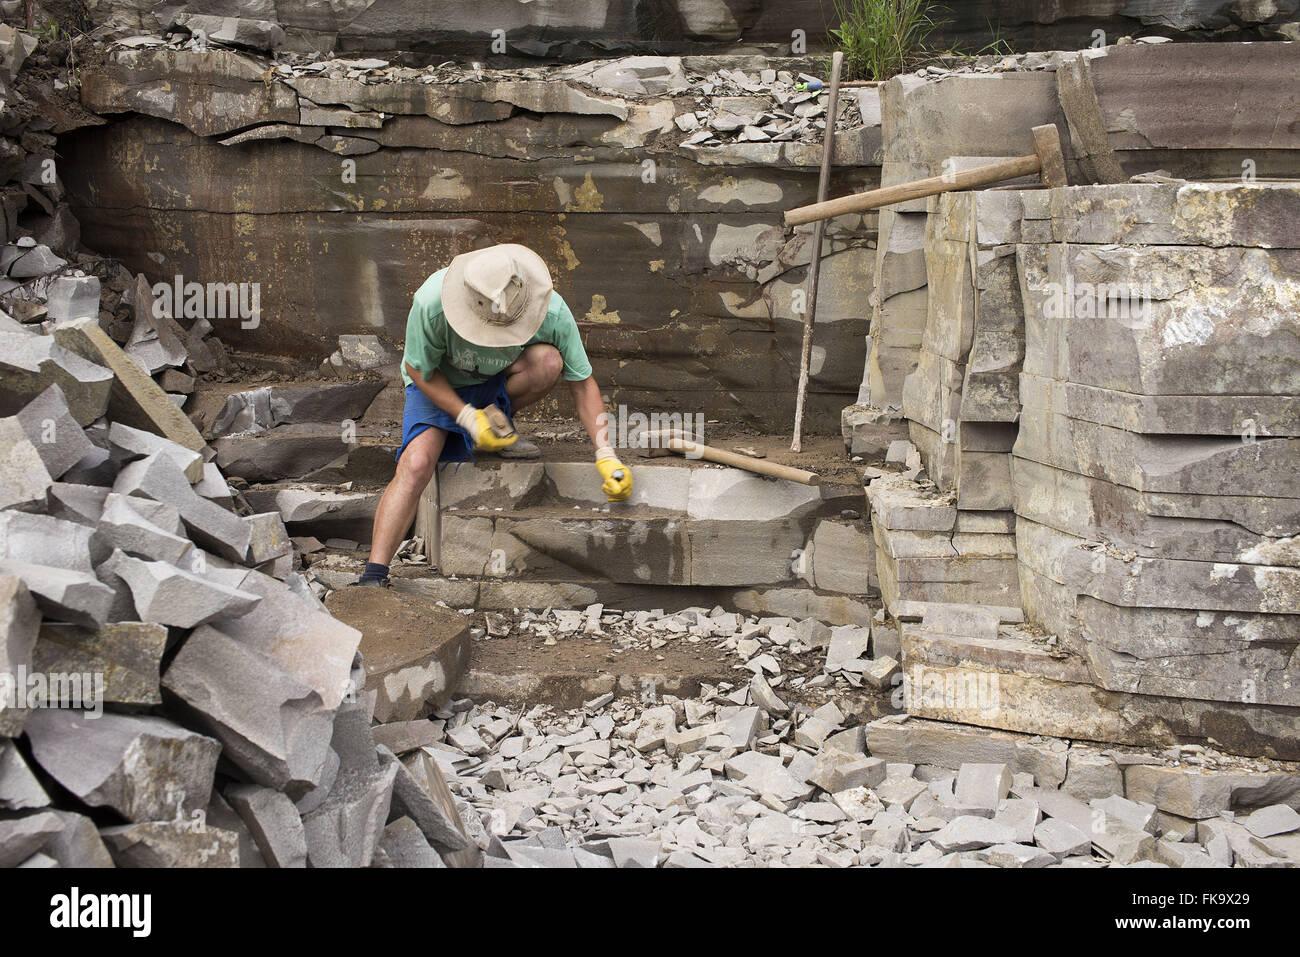 Worker extracting basaltic rocks - Stock Image